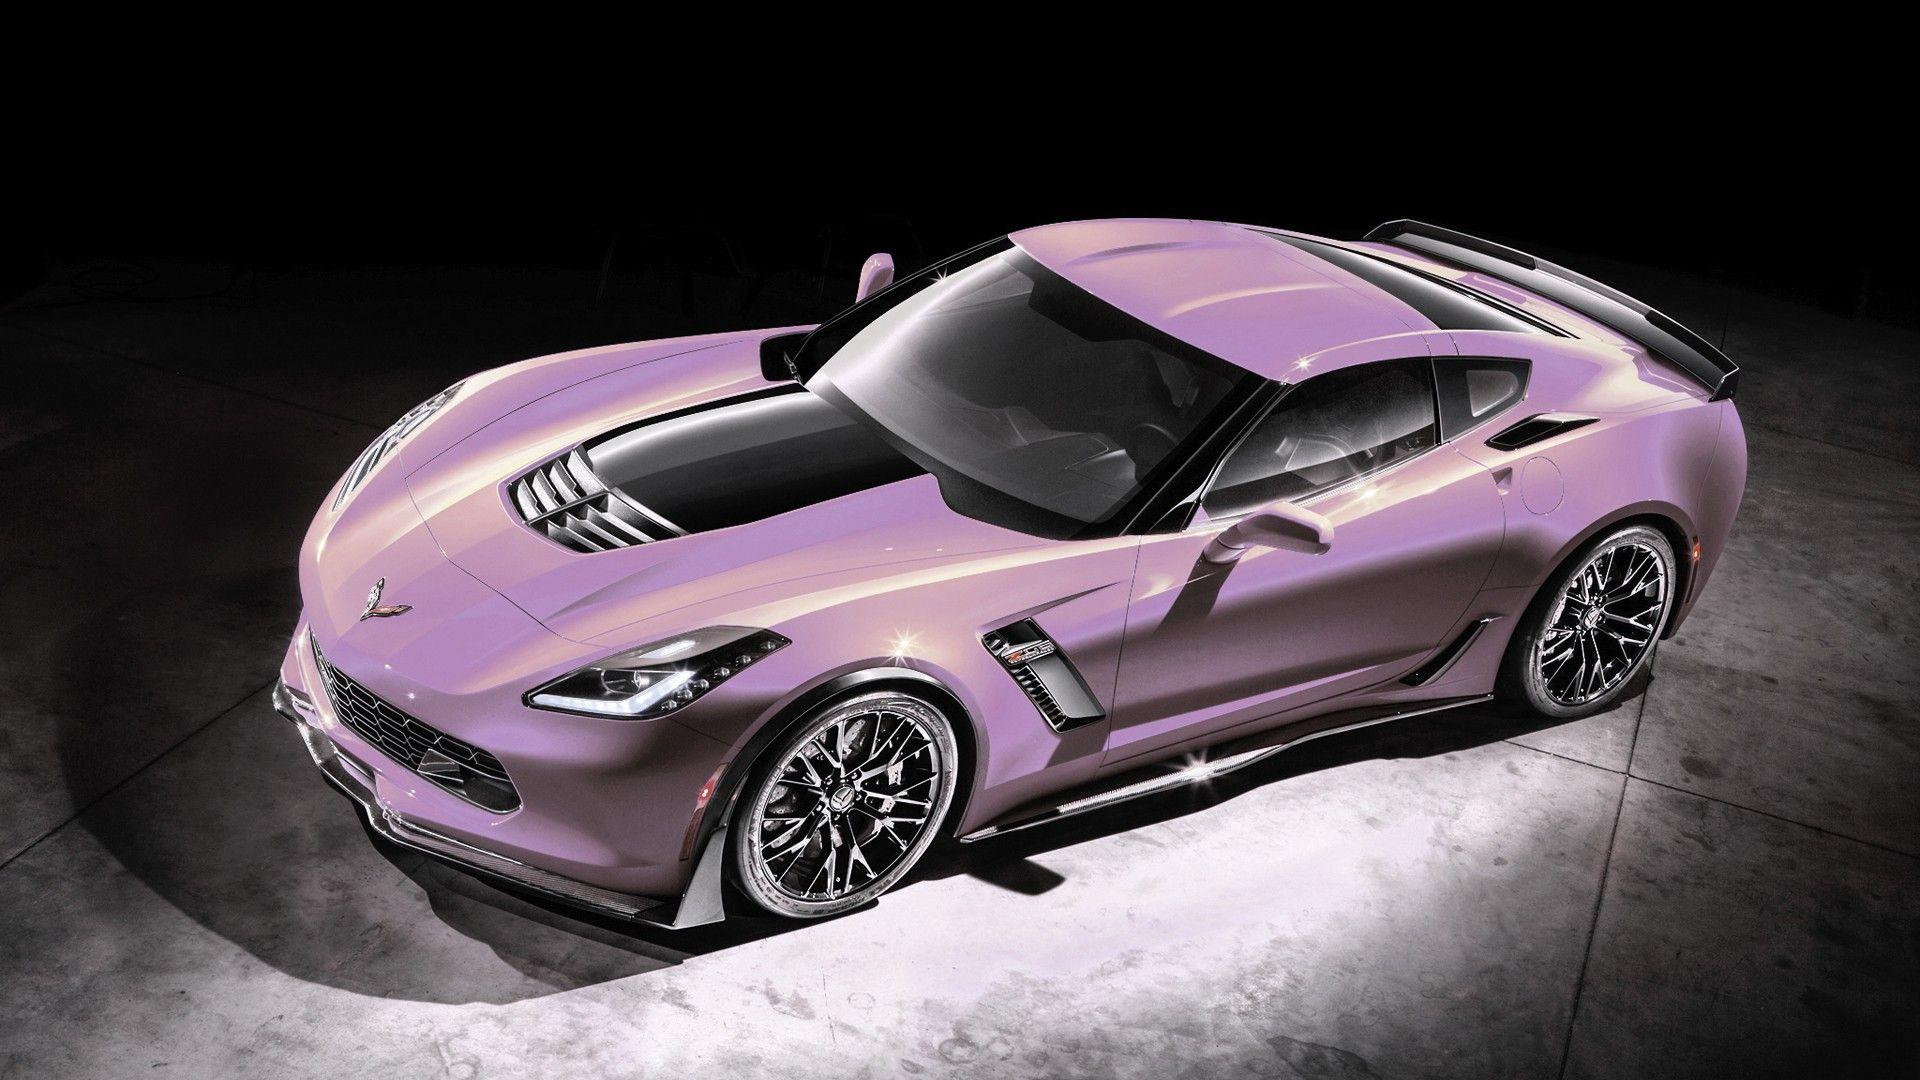 2015 Corvette Wallpapers 1920x1080